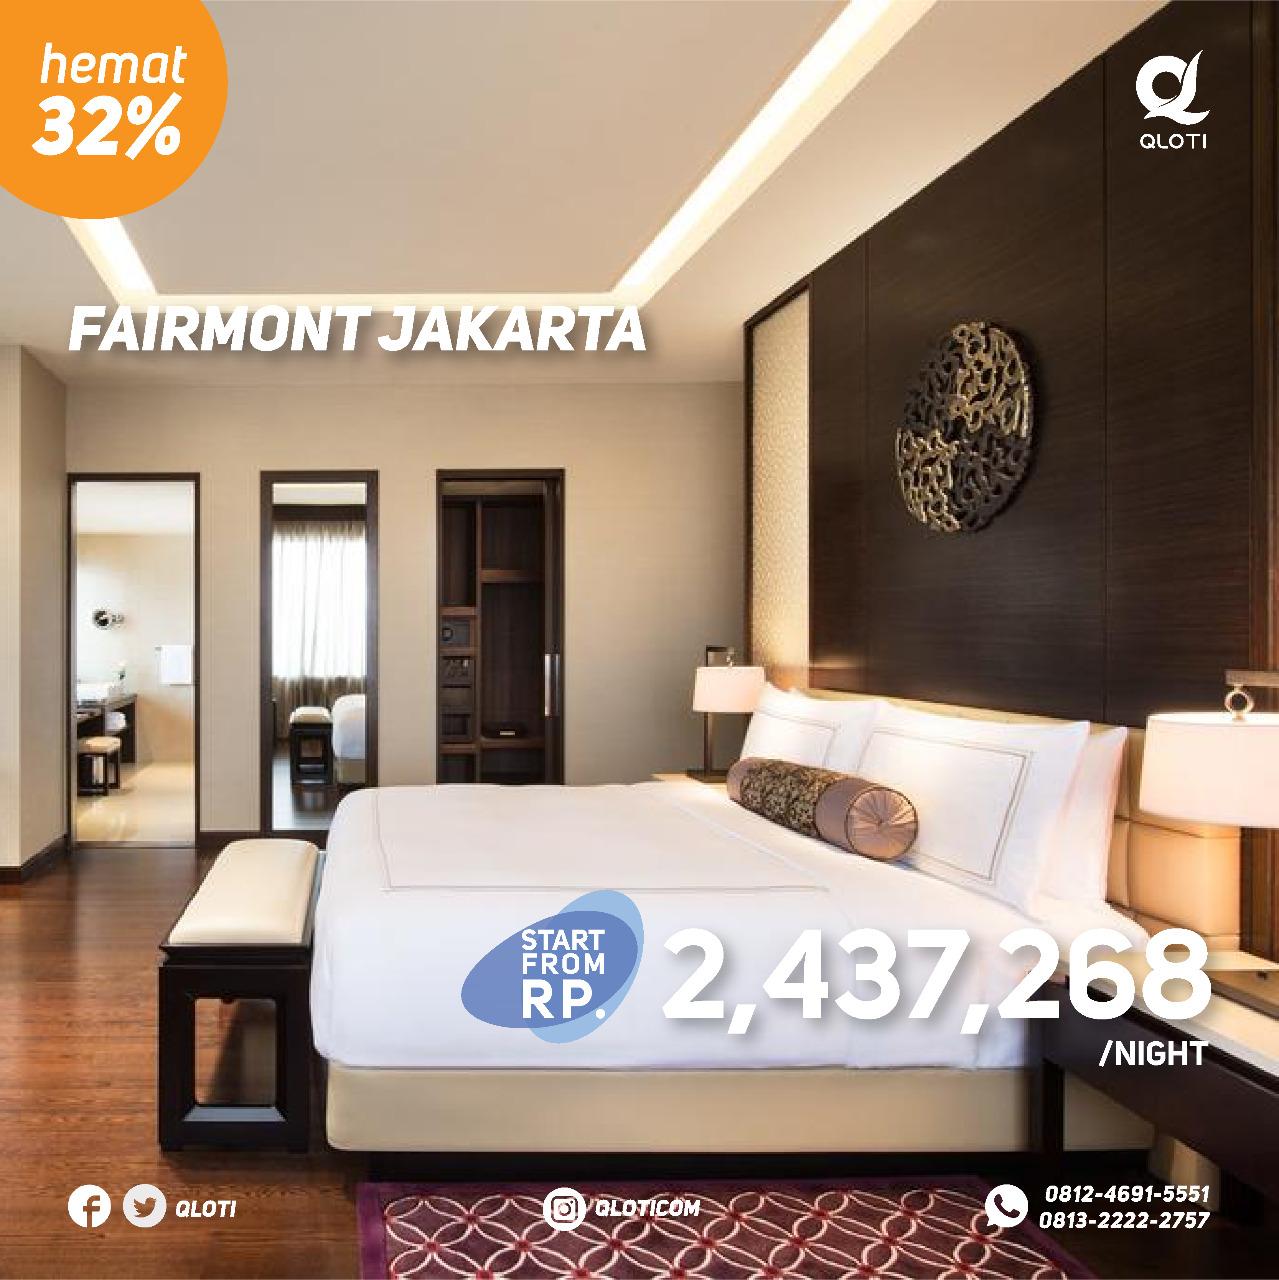 Fairmont hotel - yoexplore, liburan keluarga - yoexplore.co.id